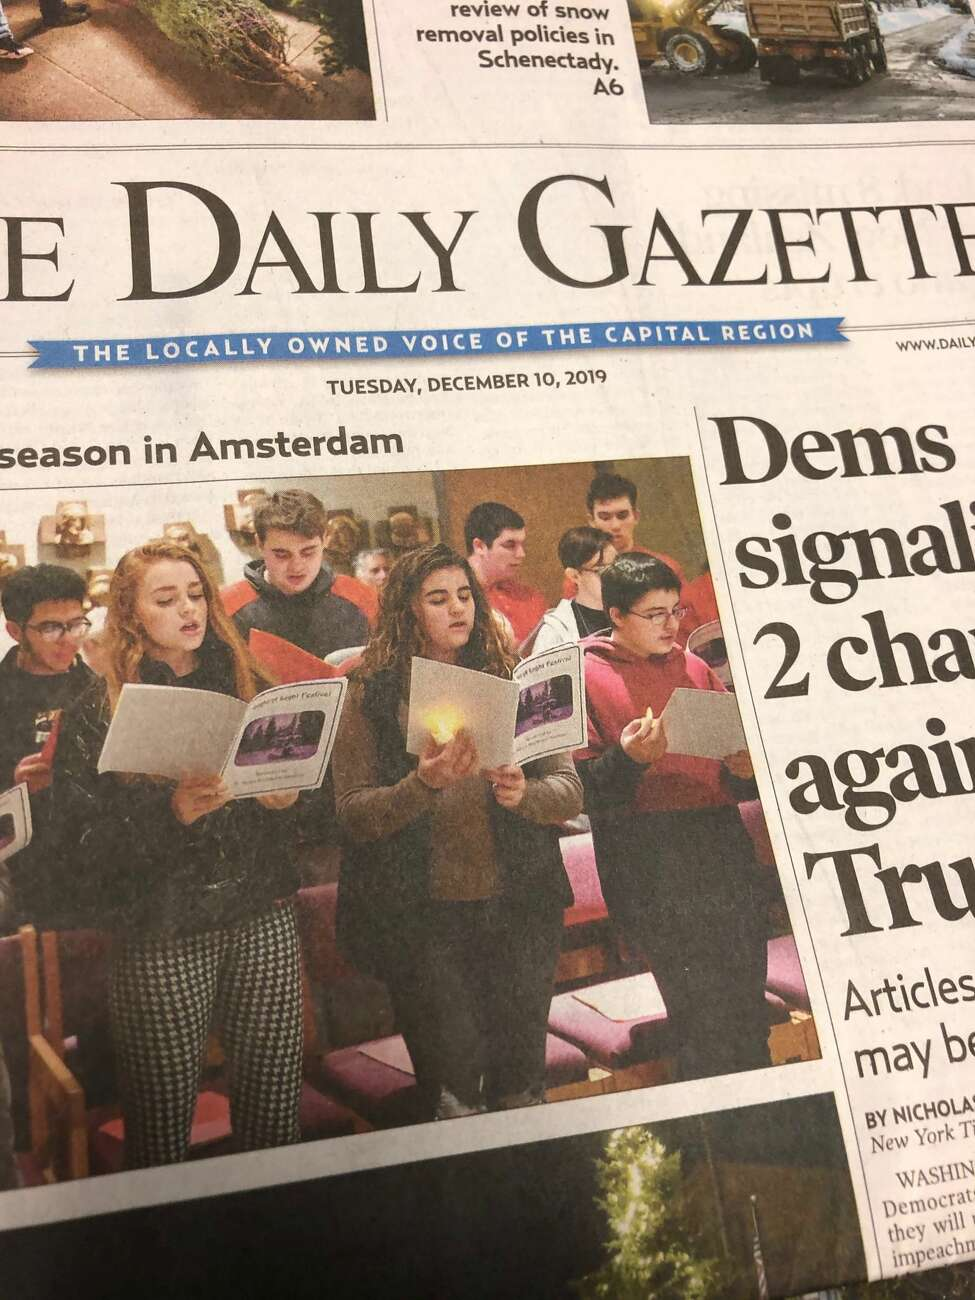 Daily Gazette newspaper on December 10, 2019.